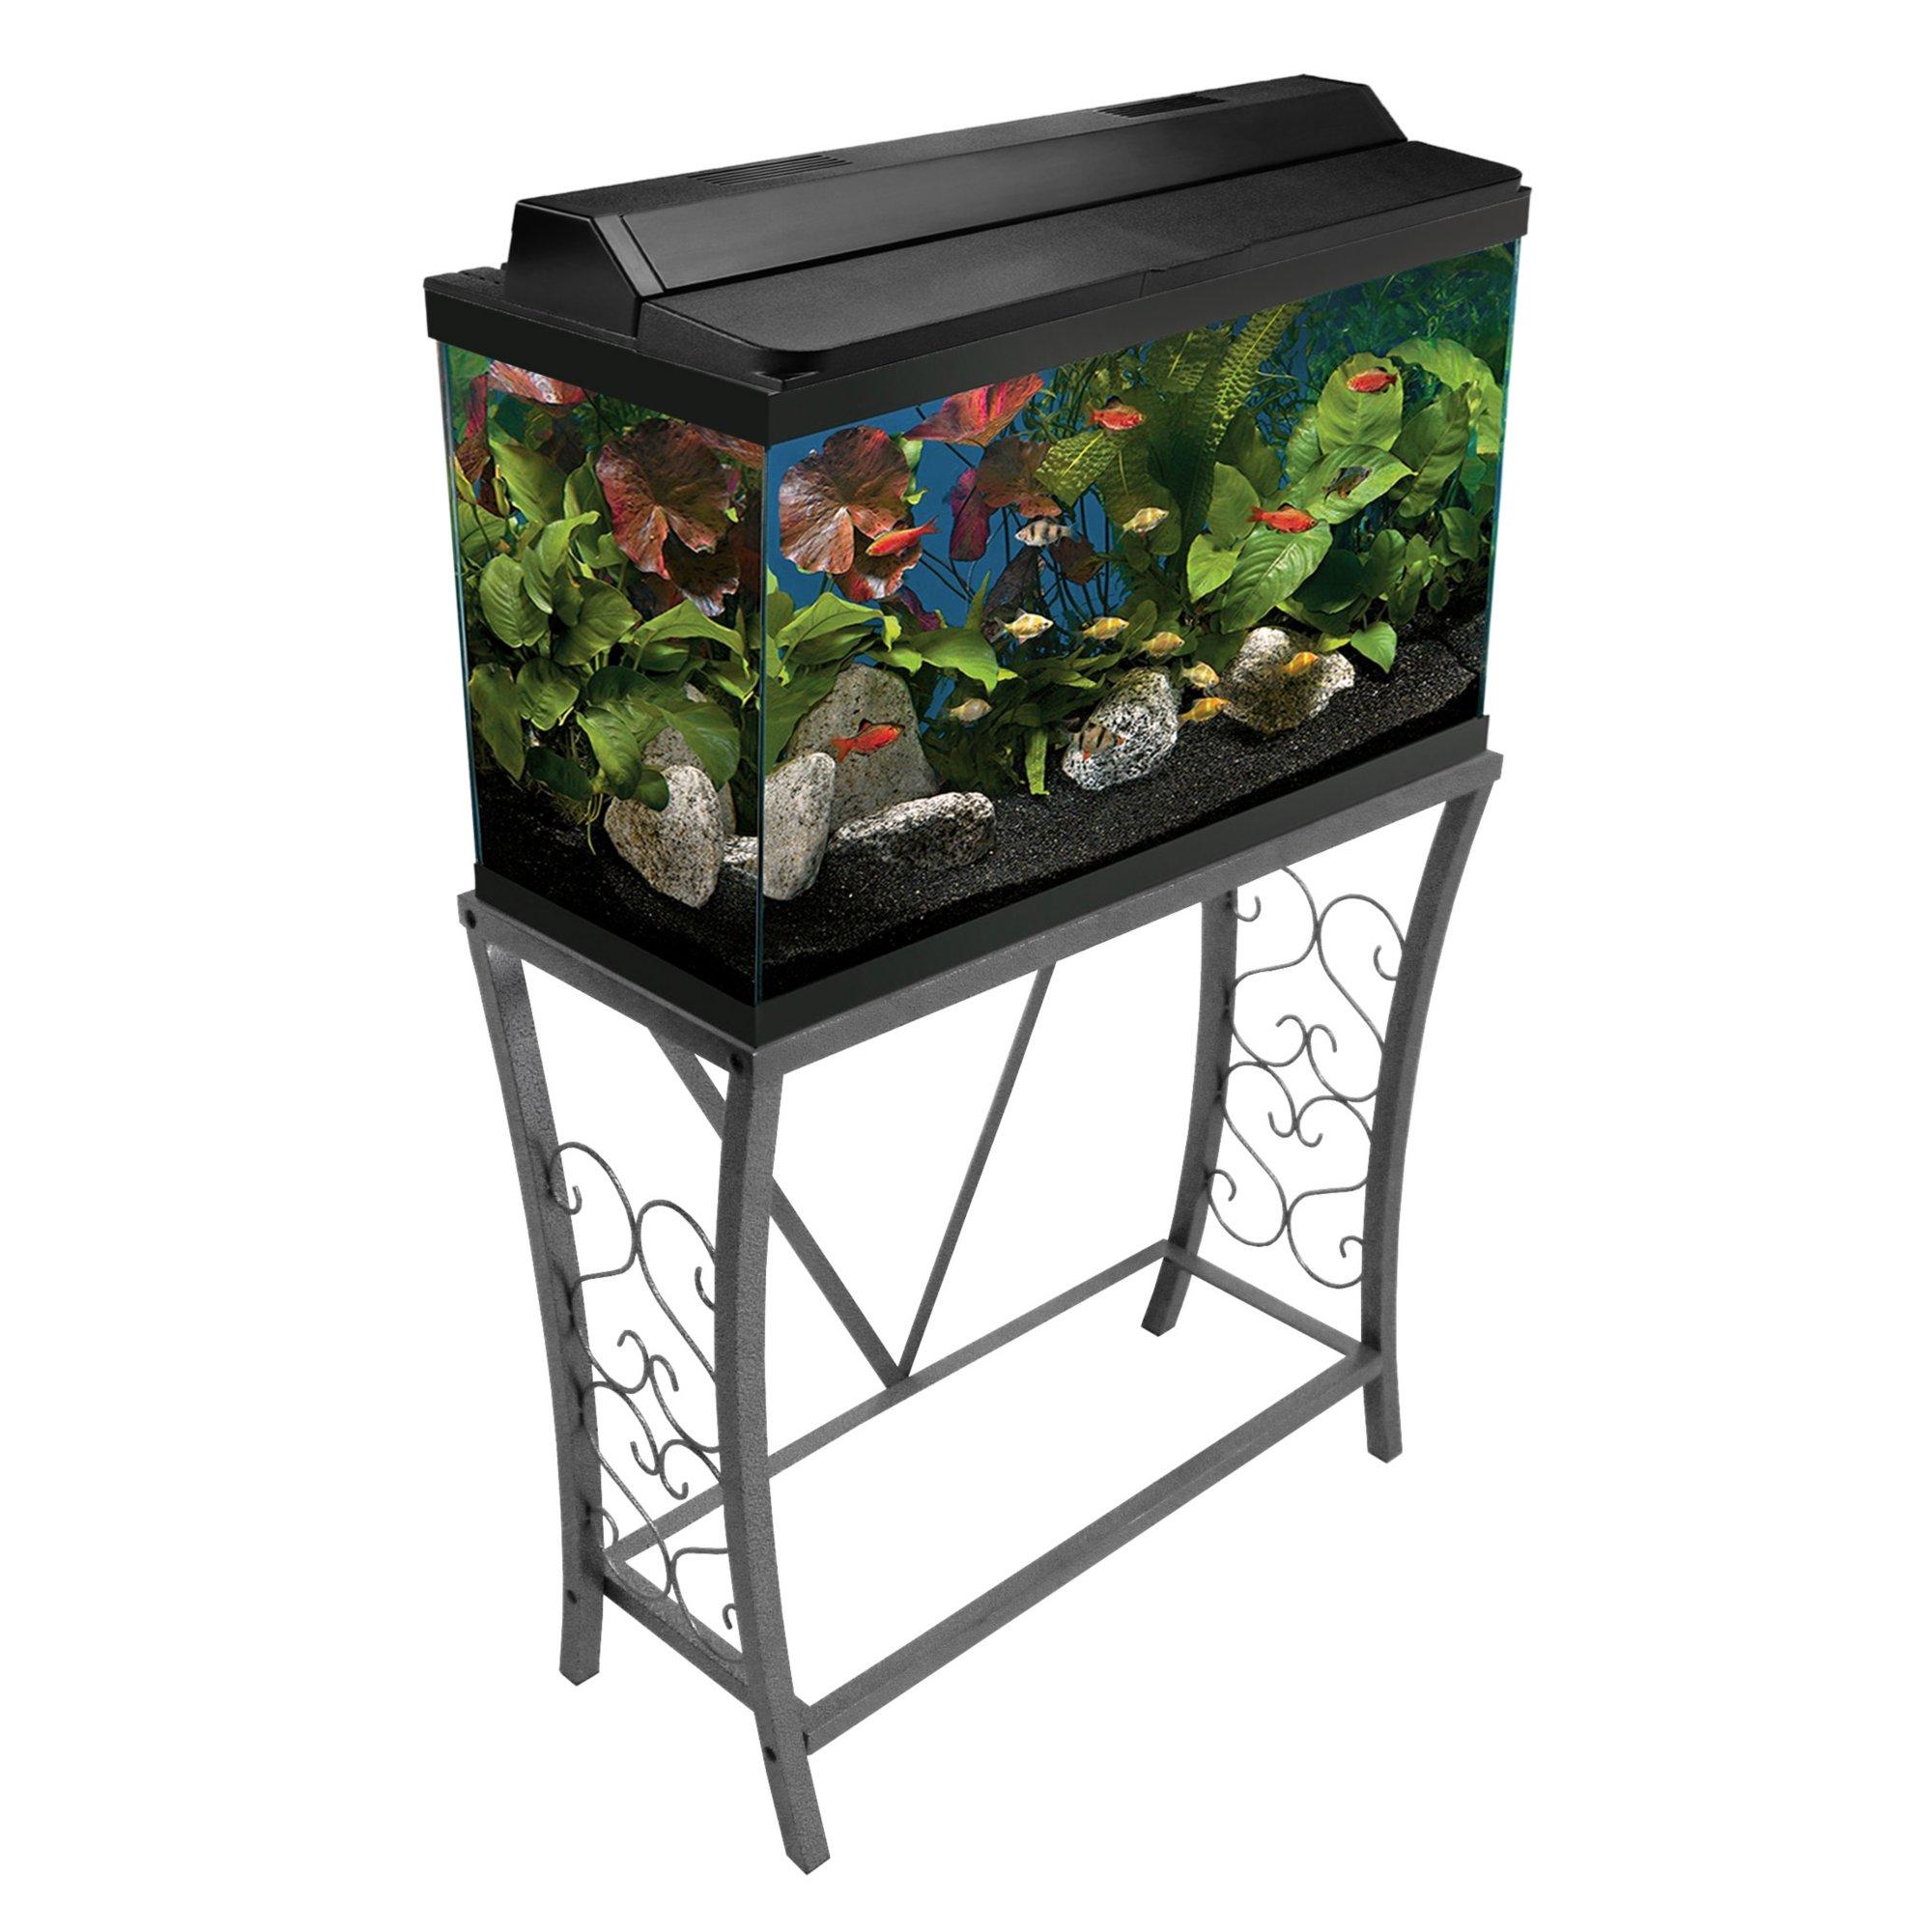 Aquatic fundamentals silver vein scroll aquarium stand 29 for 29 gallon fish tank stand